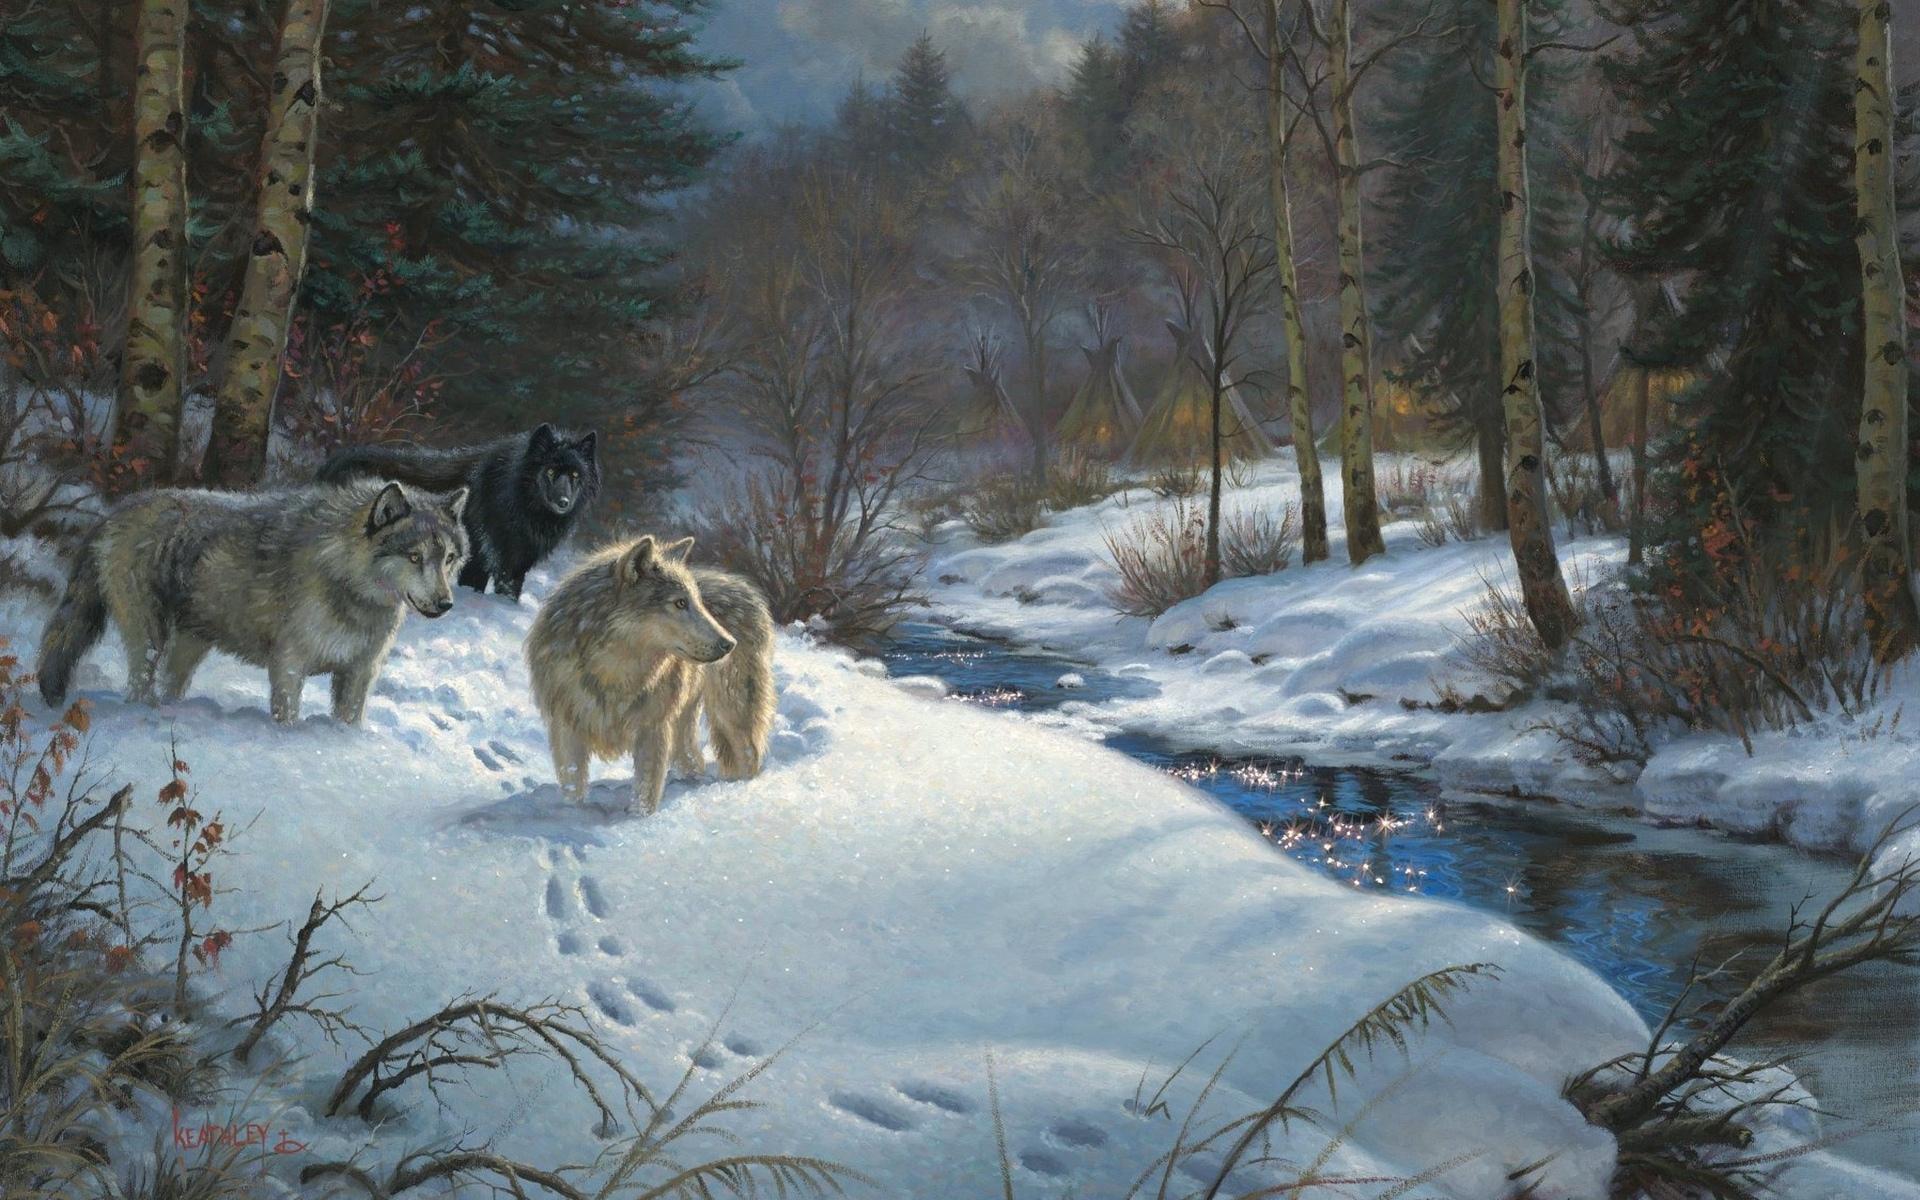 кухня волки зима пейзаж картинки развитие сам процесс